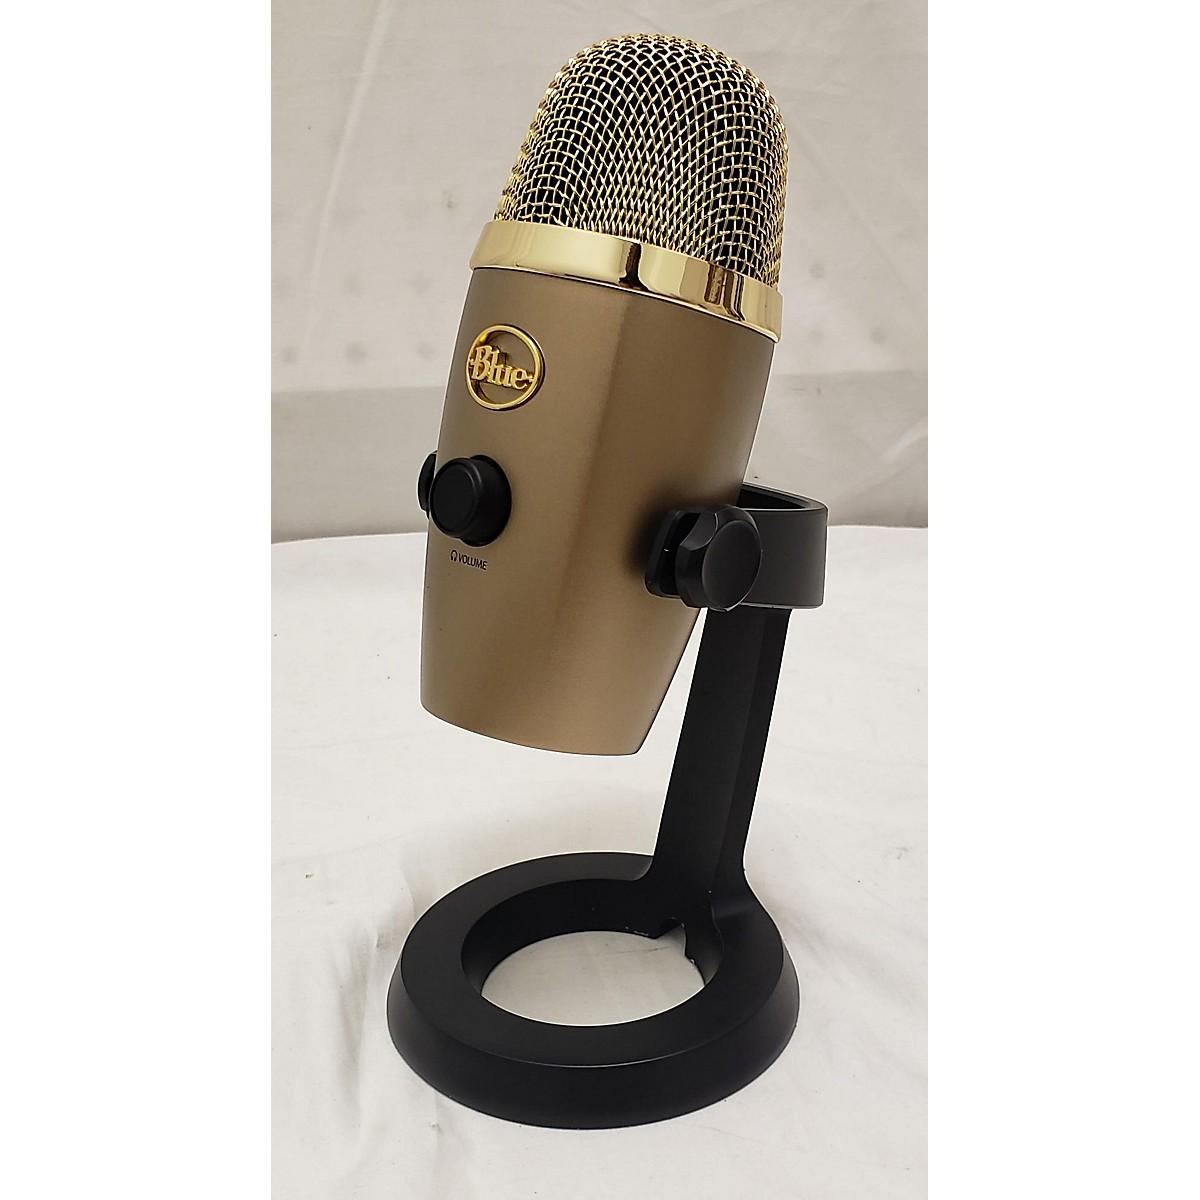 BLUE Yeti Nano USB Microphone